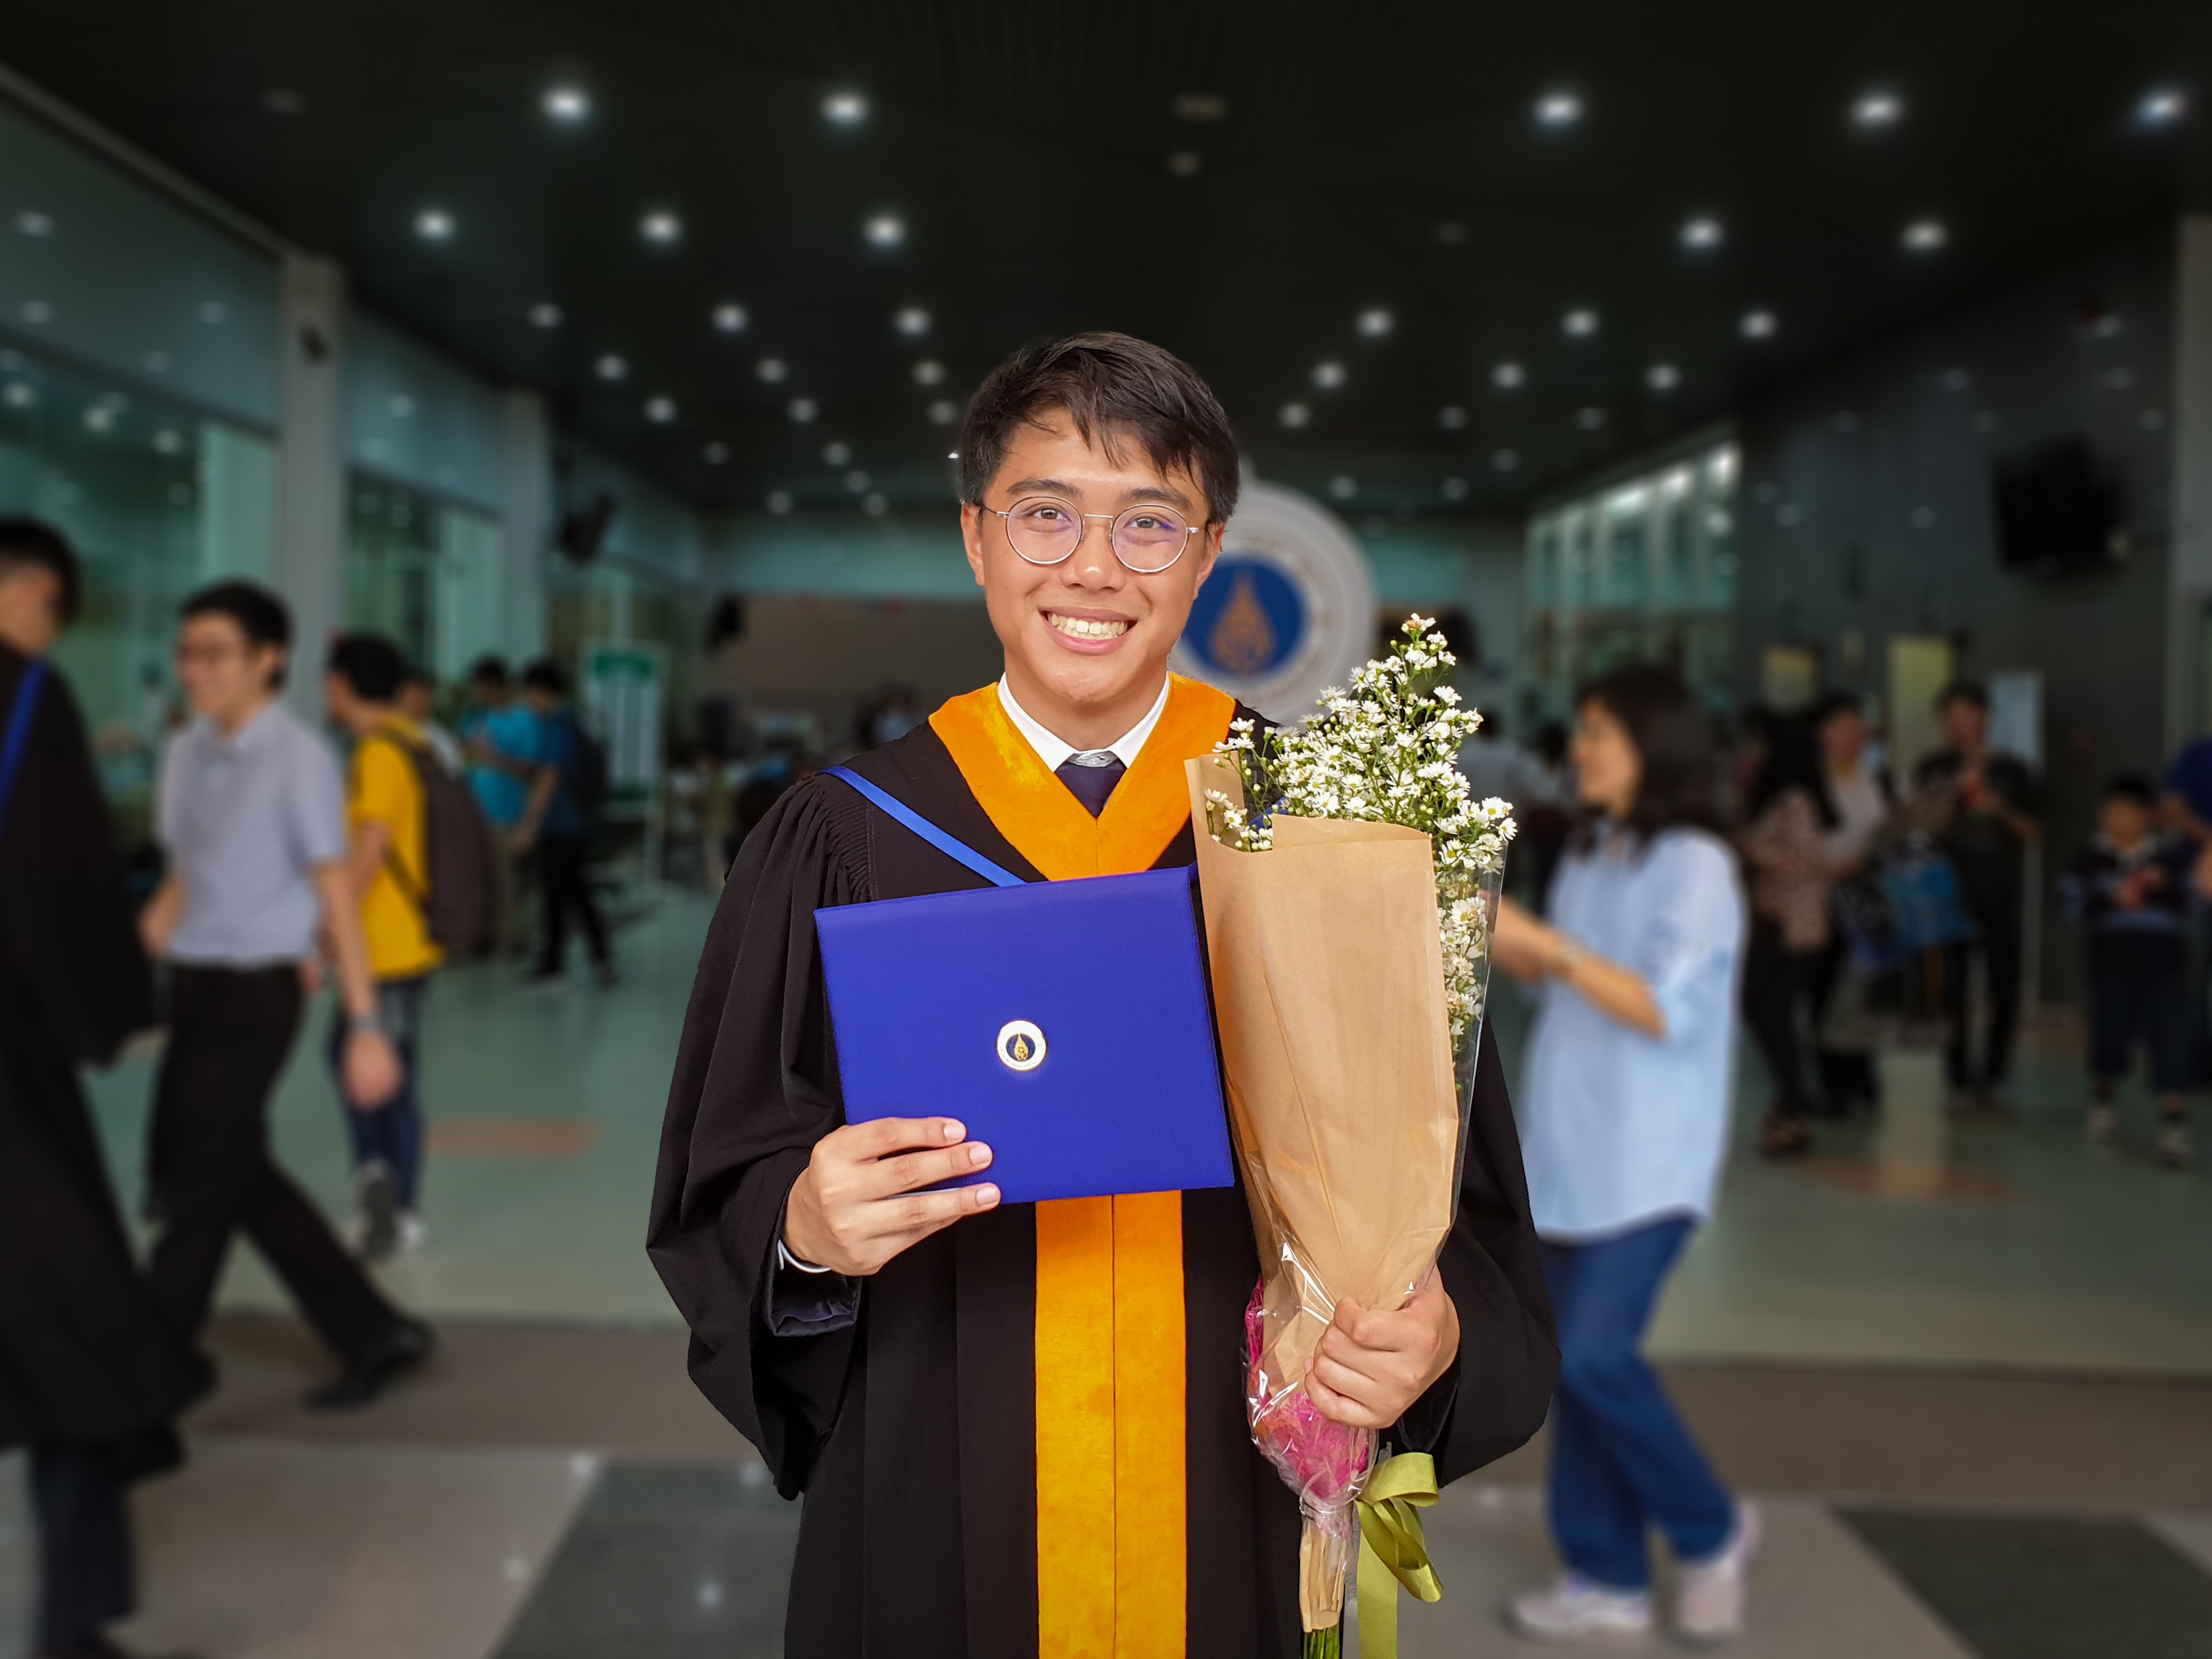 Me with Graduation